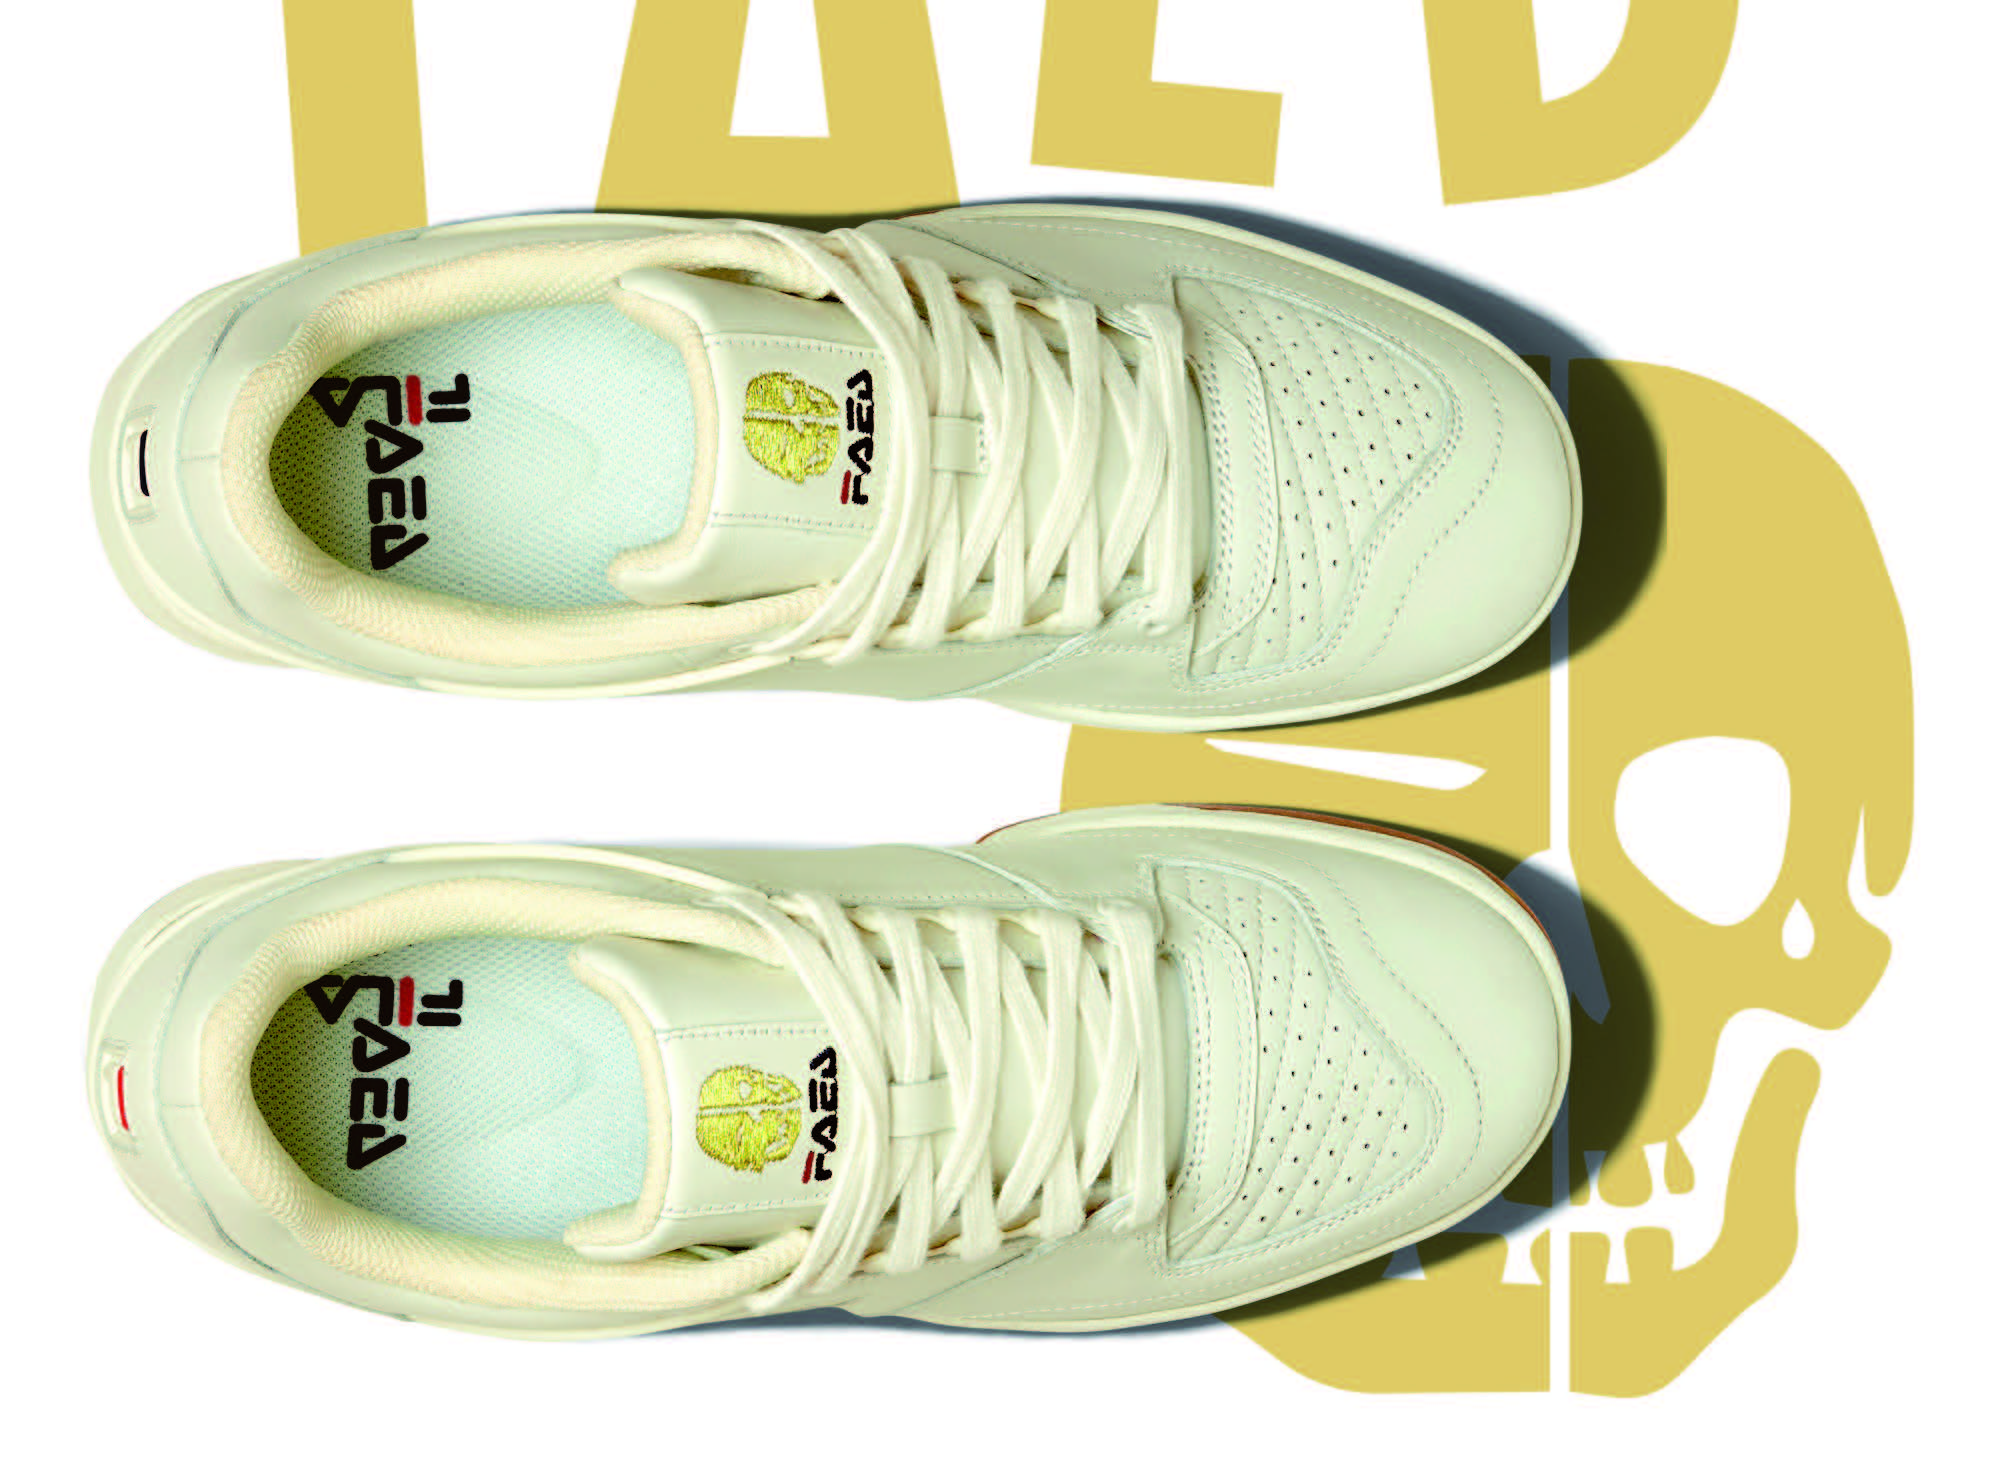 FAED X FILA TARGA - Sneakers Magazine